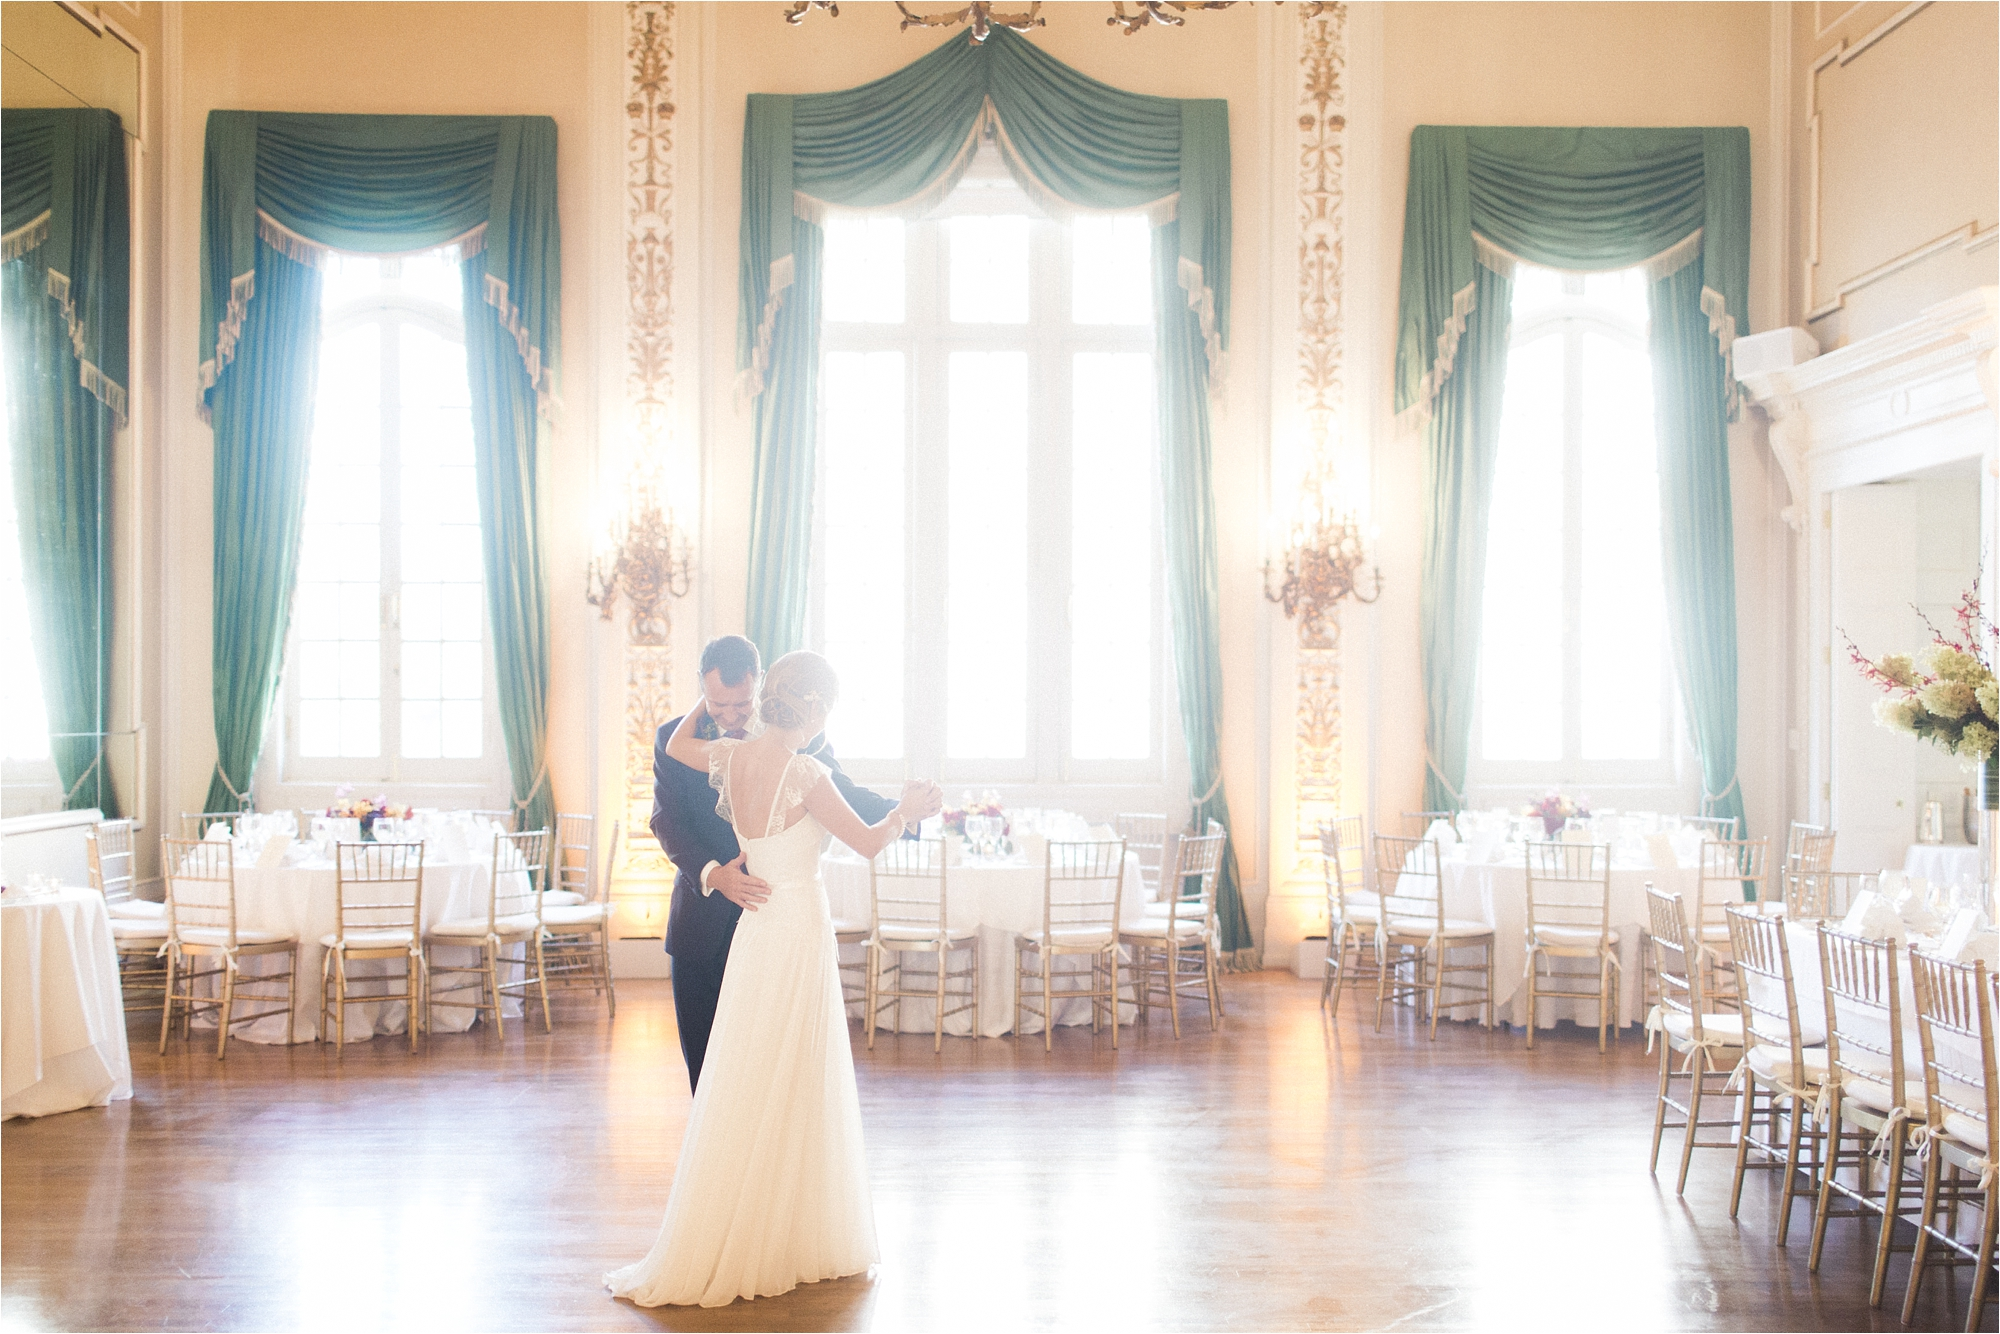 stephanie-yonce-photography-elegant-private-club-washington-dc-wedding-photos_0038.jpg